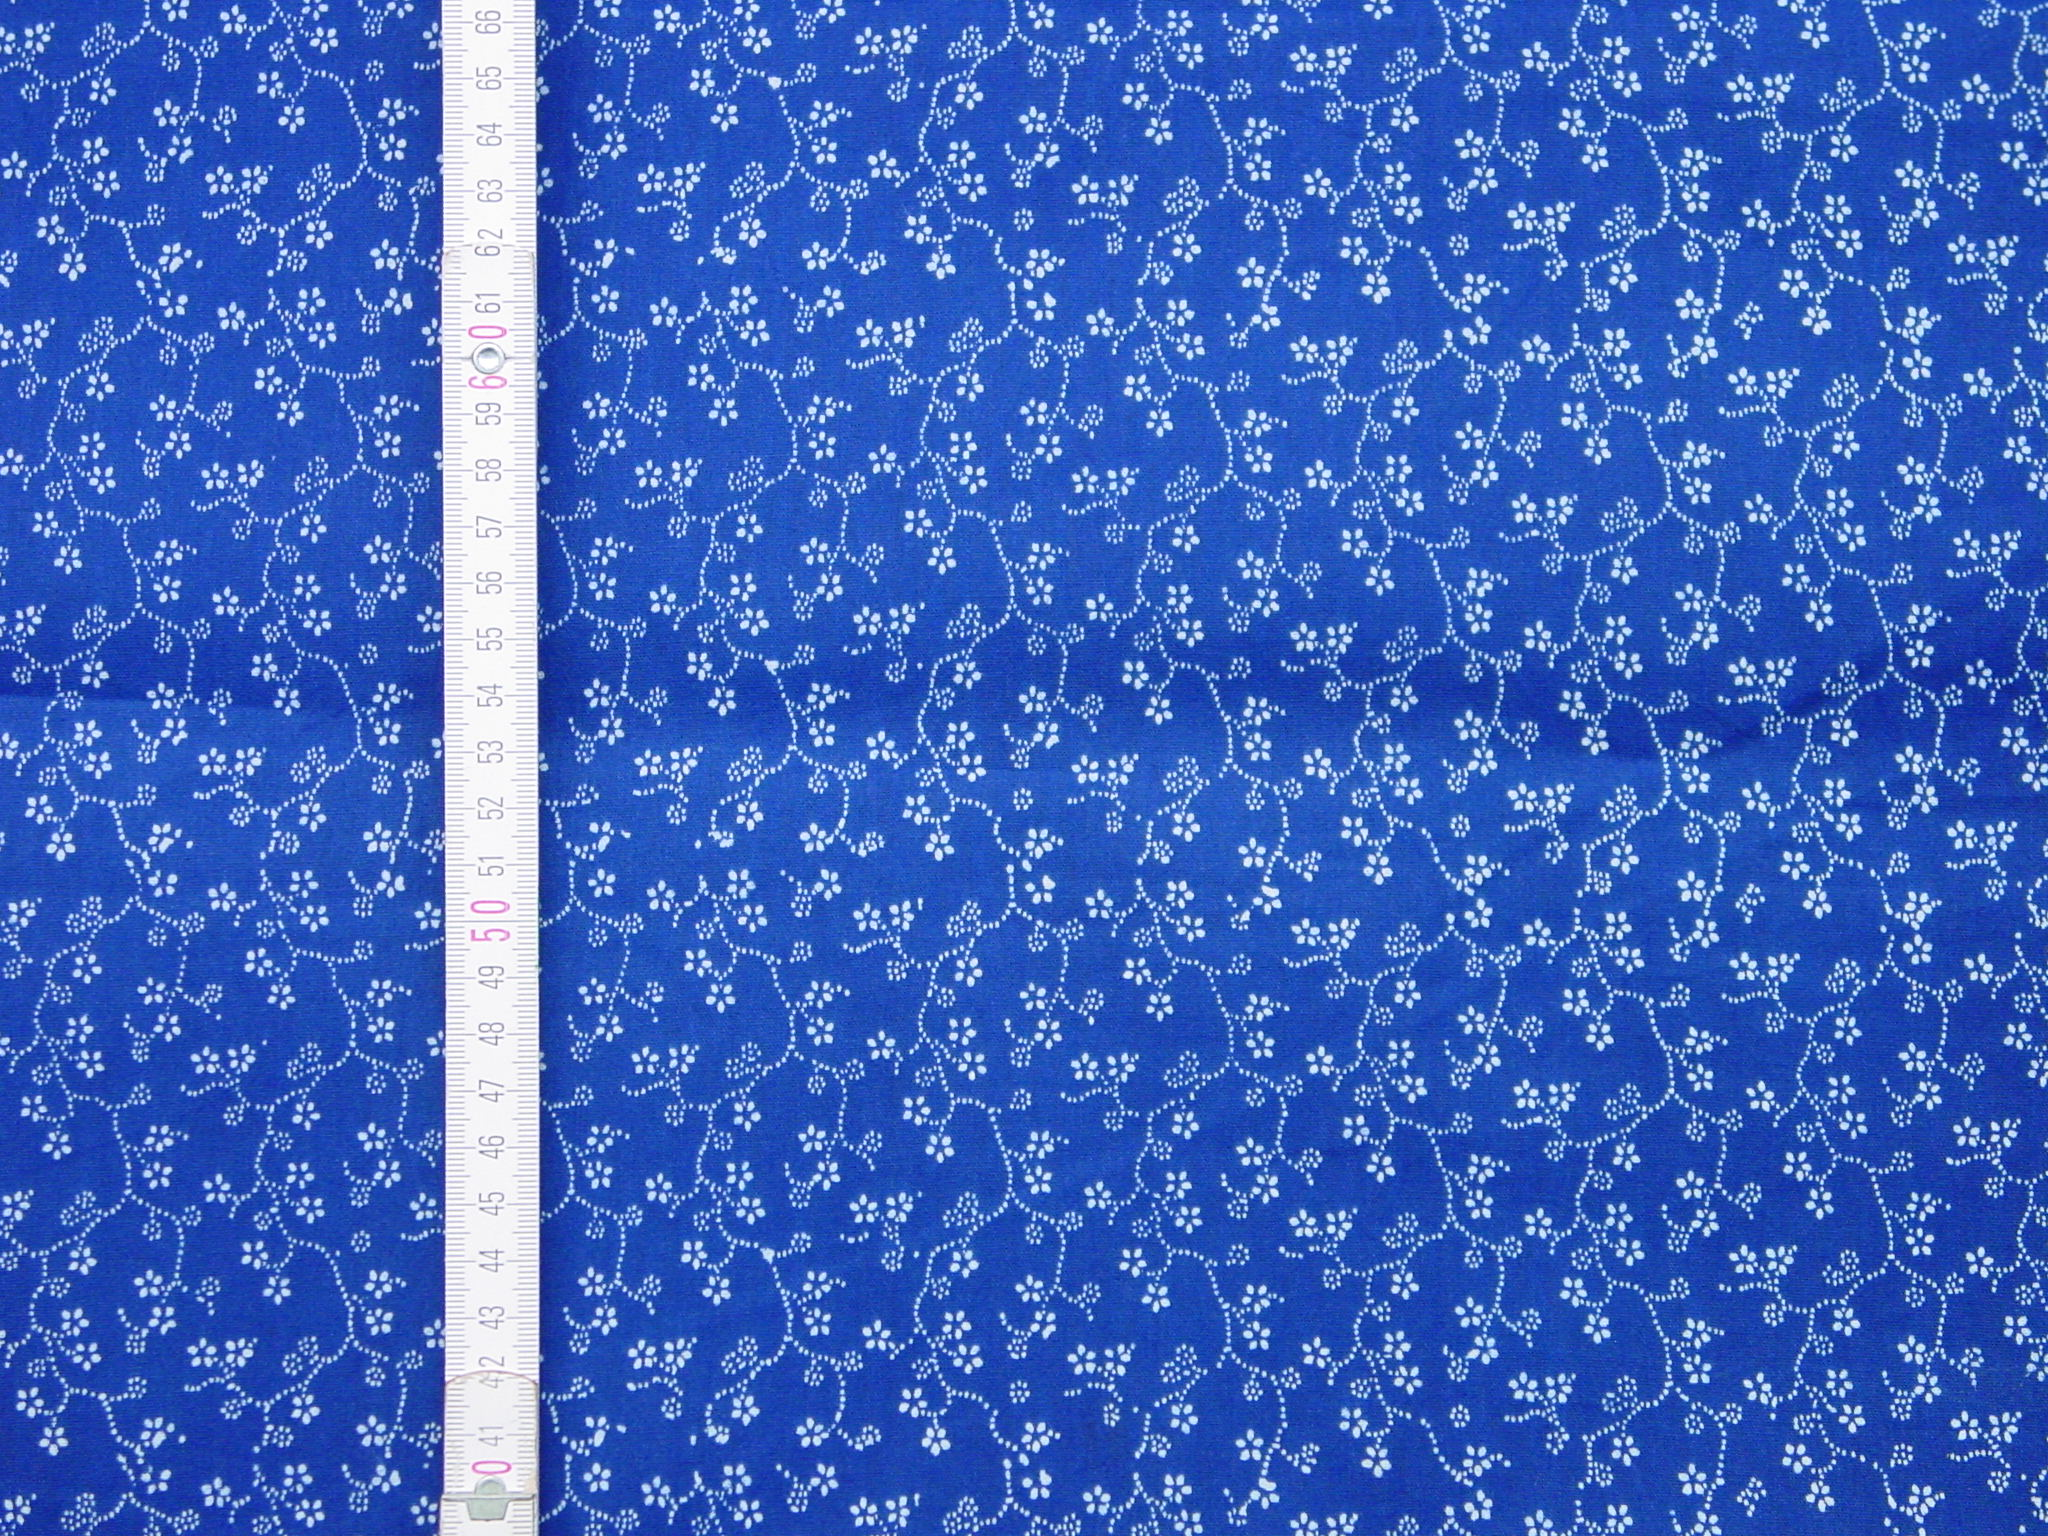 Blaudruckstoff 054-0